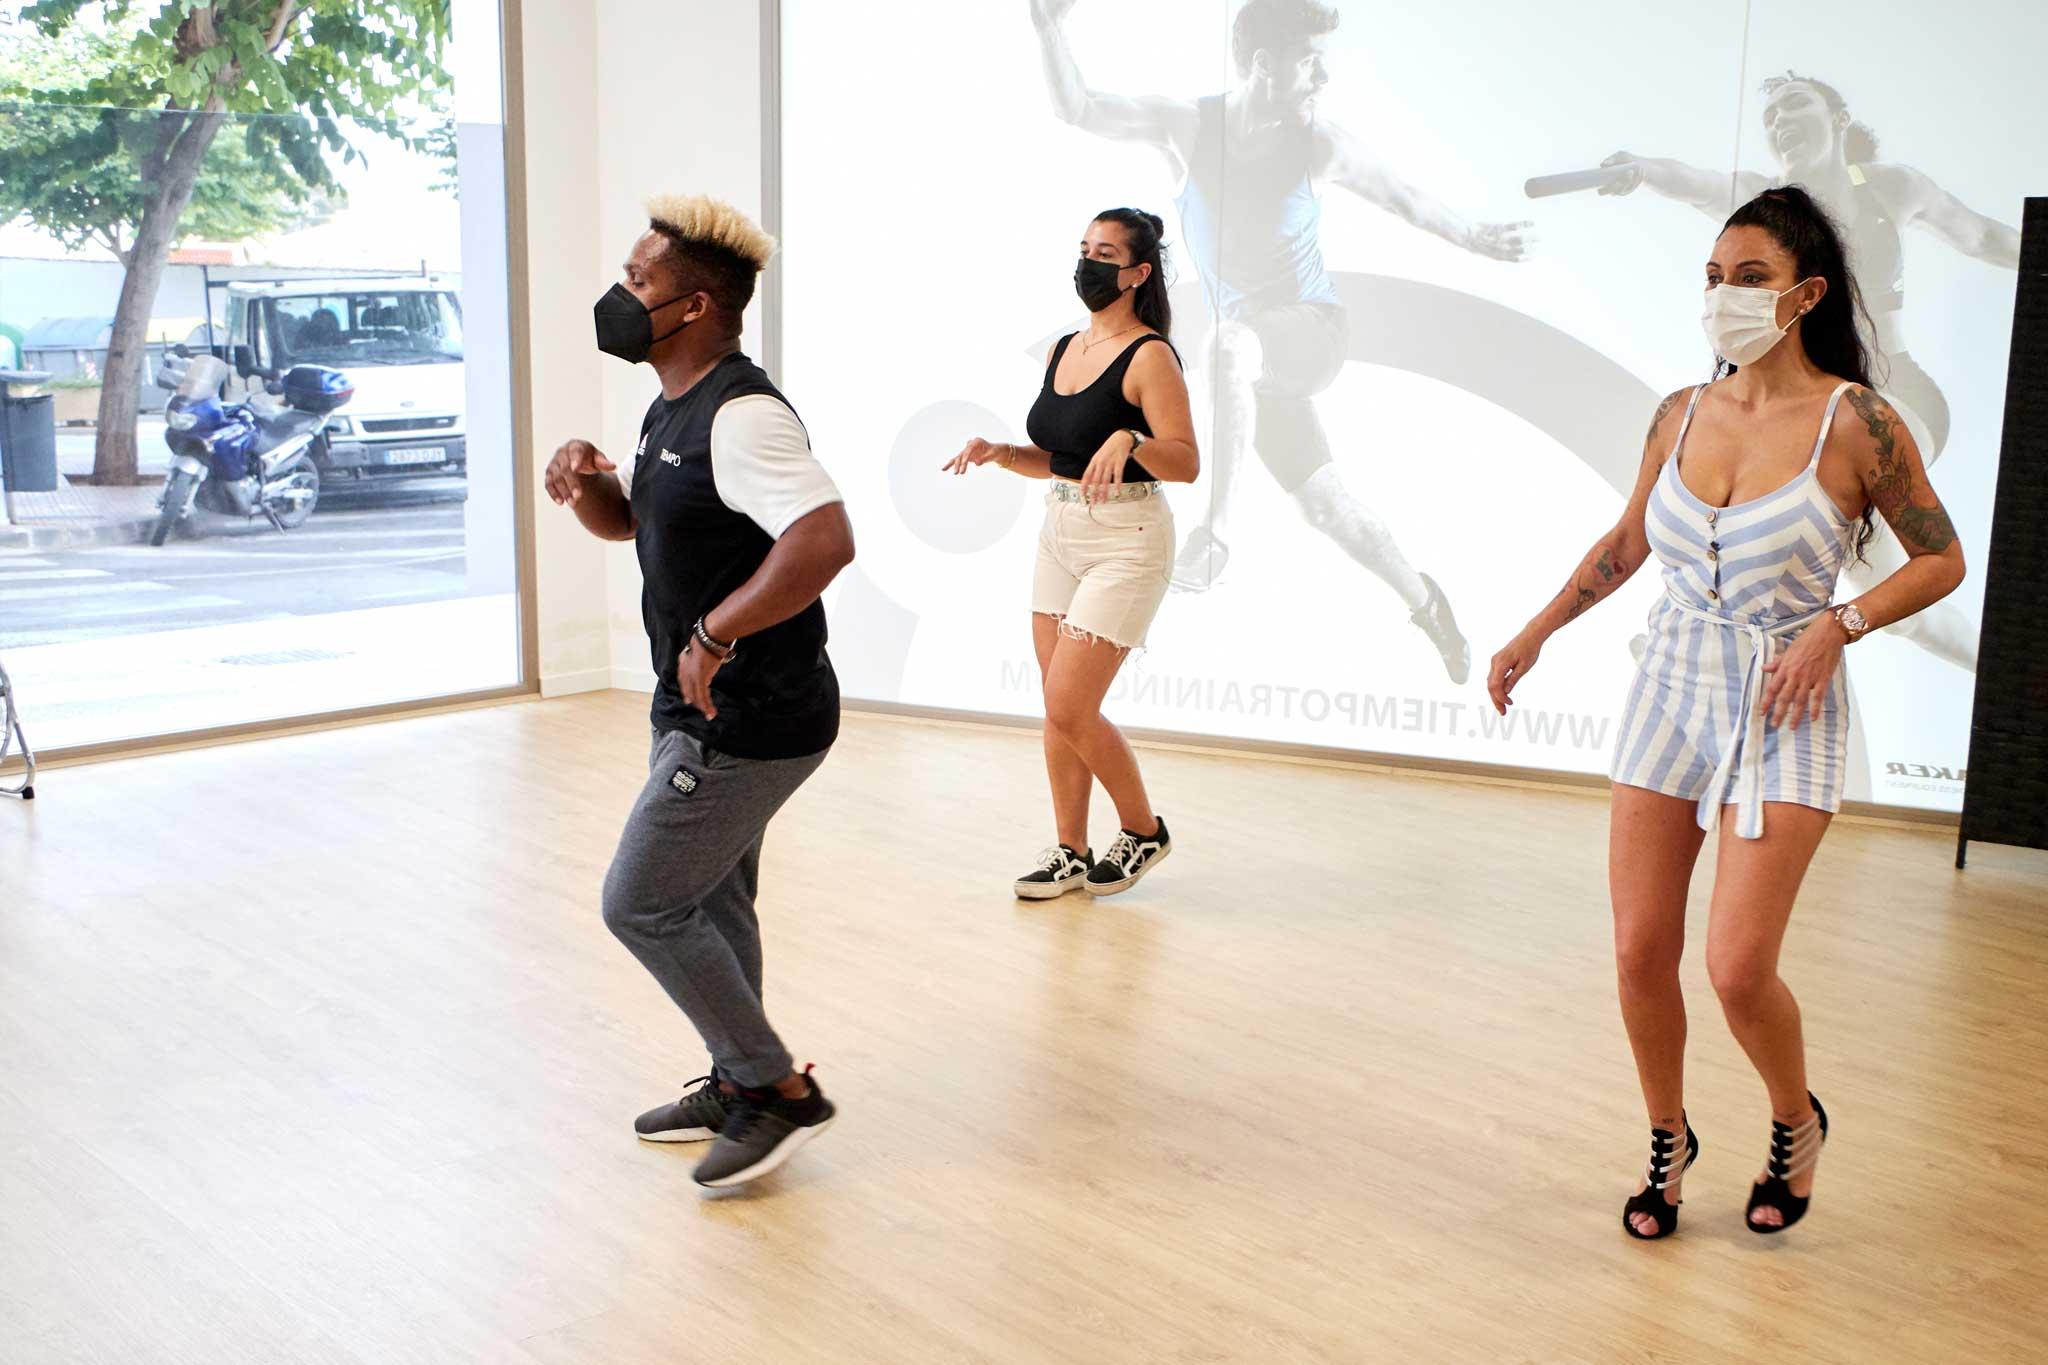 Clases de baile Javea – Tiempo Personal Training Center